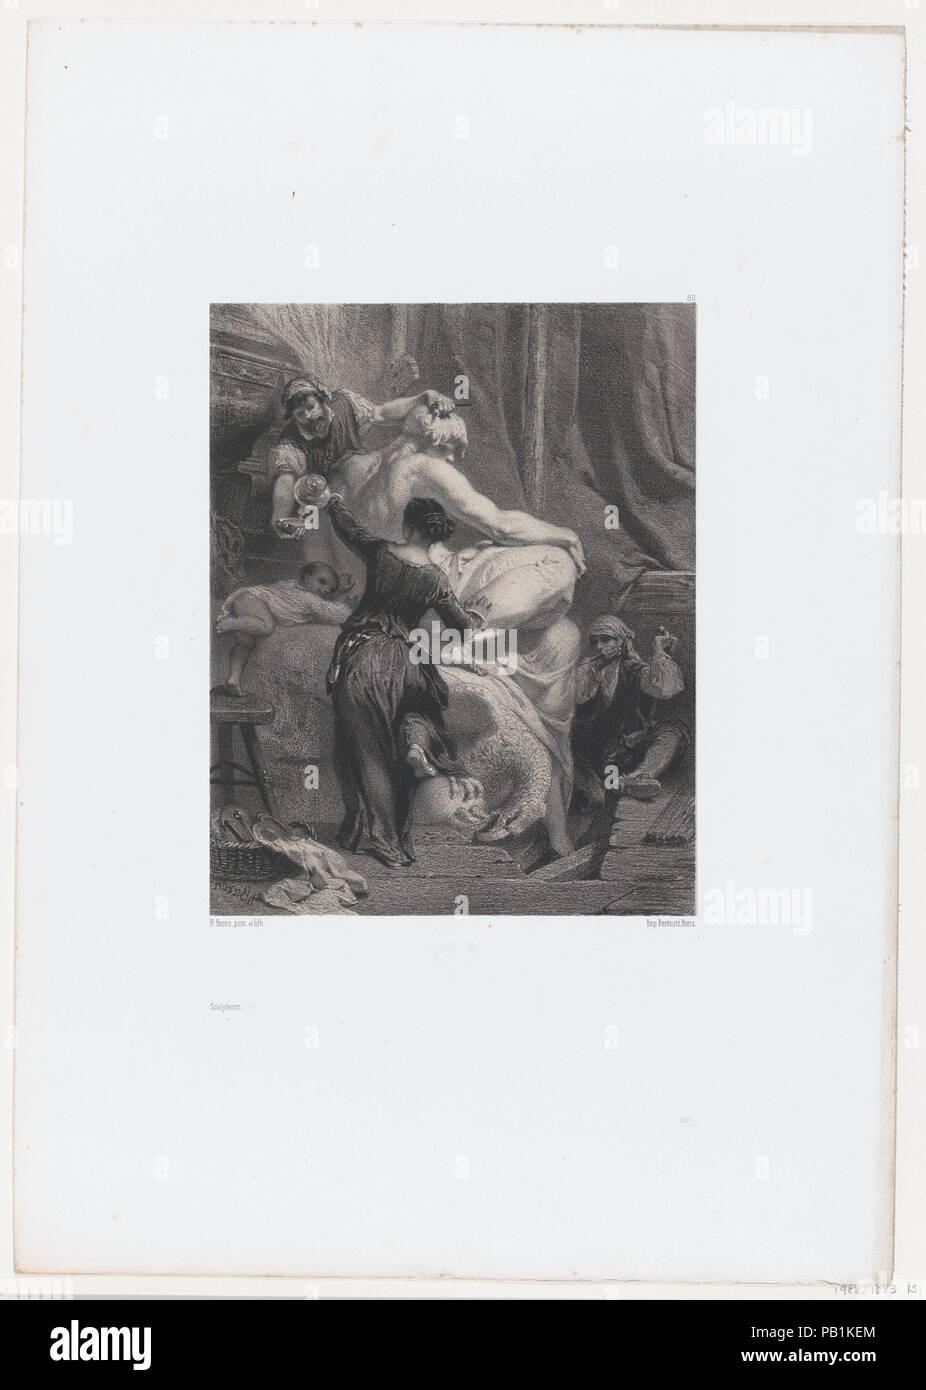 The Sculptors. Artist: Henri-Charles-Antoine Baron (French, Besançon 1816-1885 Geneva); Bertauts. Dimensions: Sheet: 17 5/8 × 12 5/16 in. (44.7 × 31.3 cm)  Image: 8 9/16 × 6 3/4 in. (21.7 × 17.2 cm). Series/Portfolio: Les Artistes Anciens et Modernes. Date: 1853. Museum: Metropolitan Museum of Art, New York, USA. - Stock Image